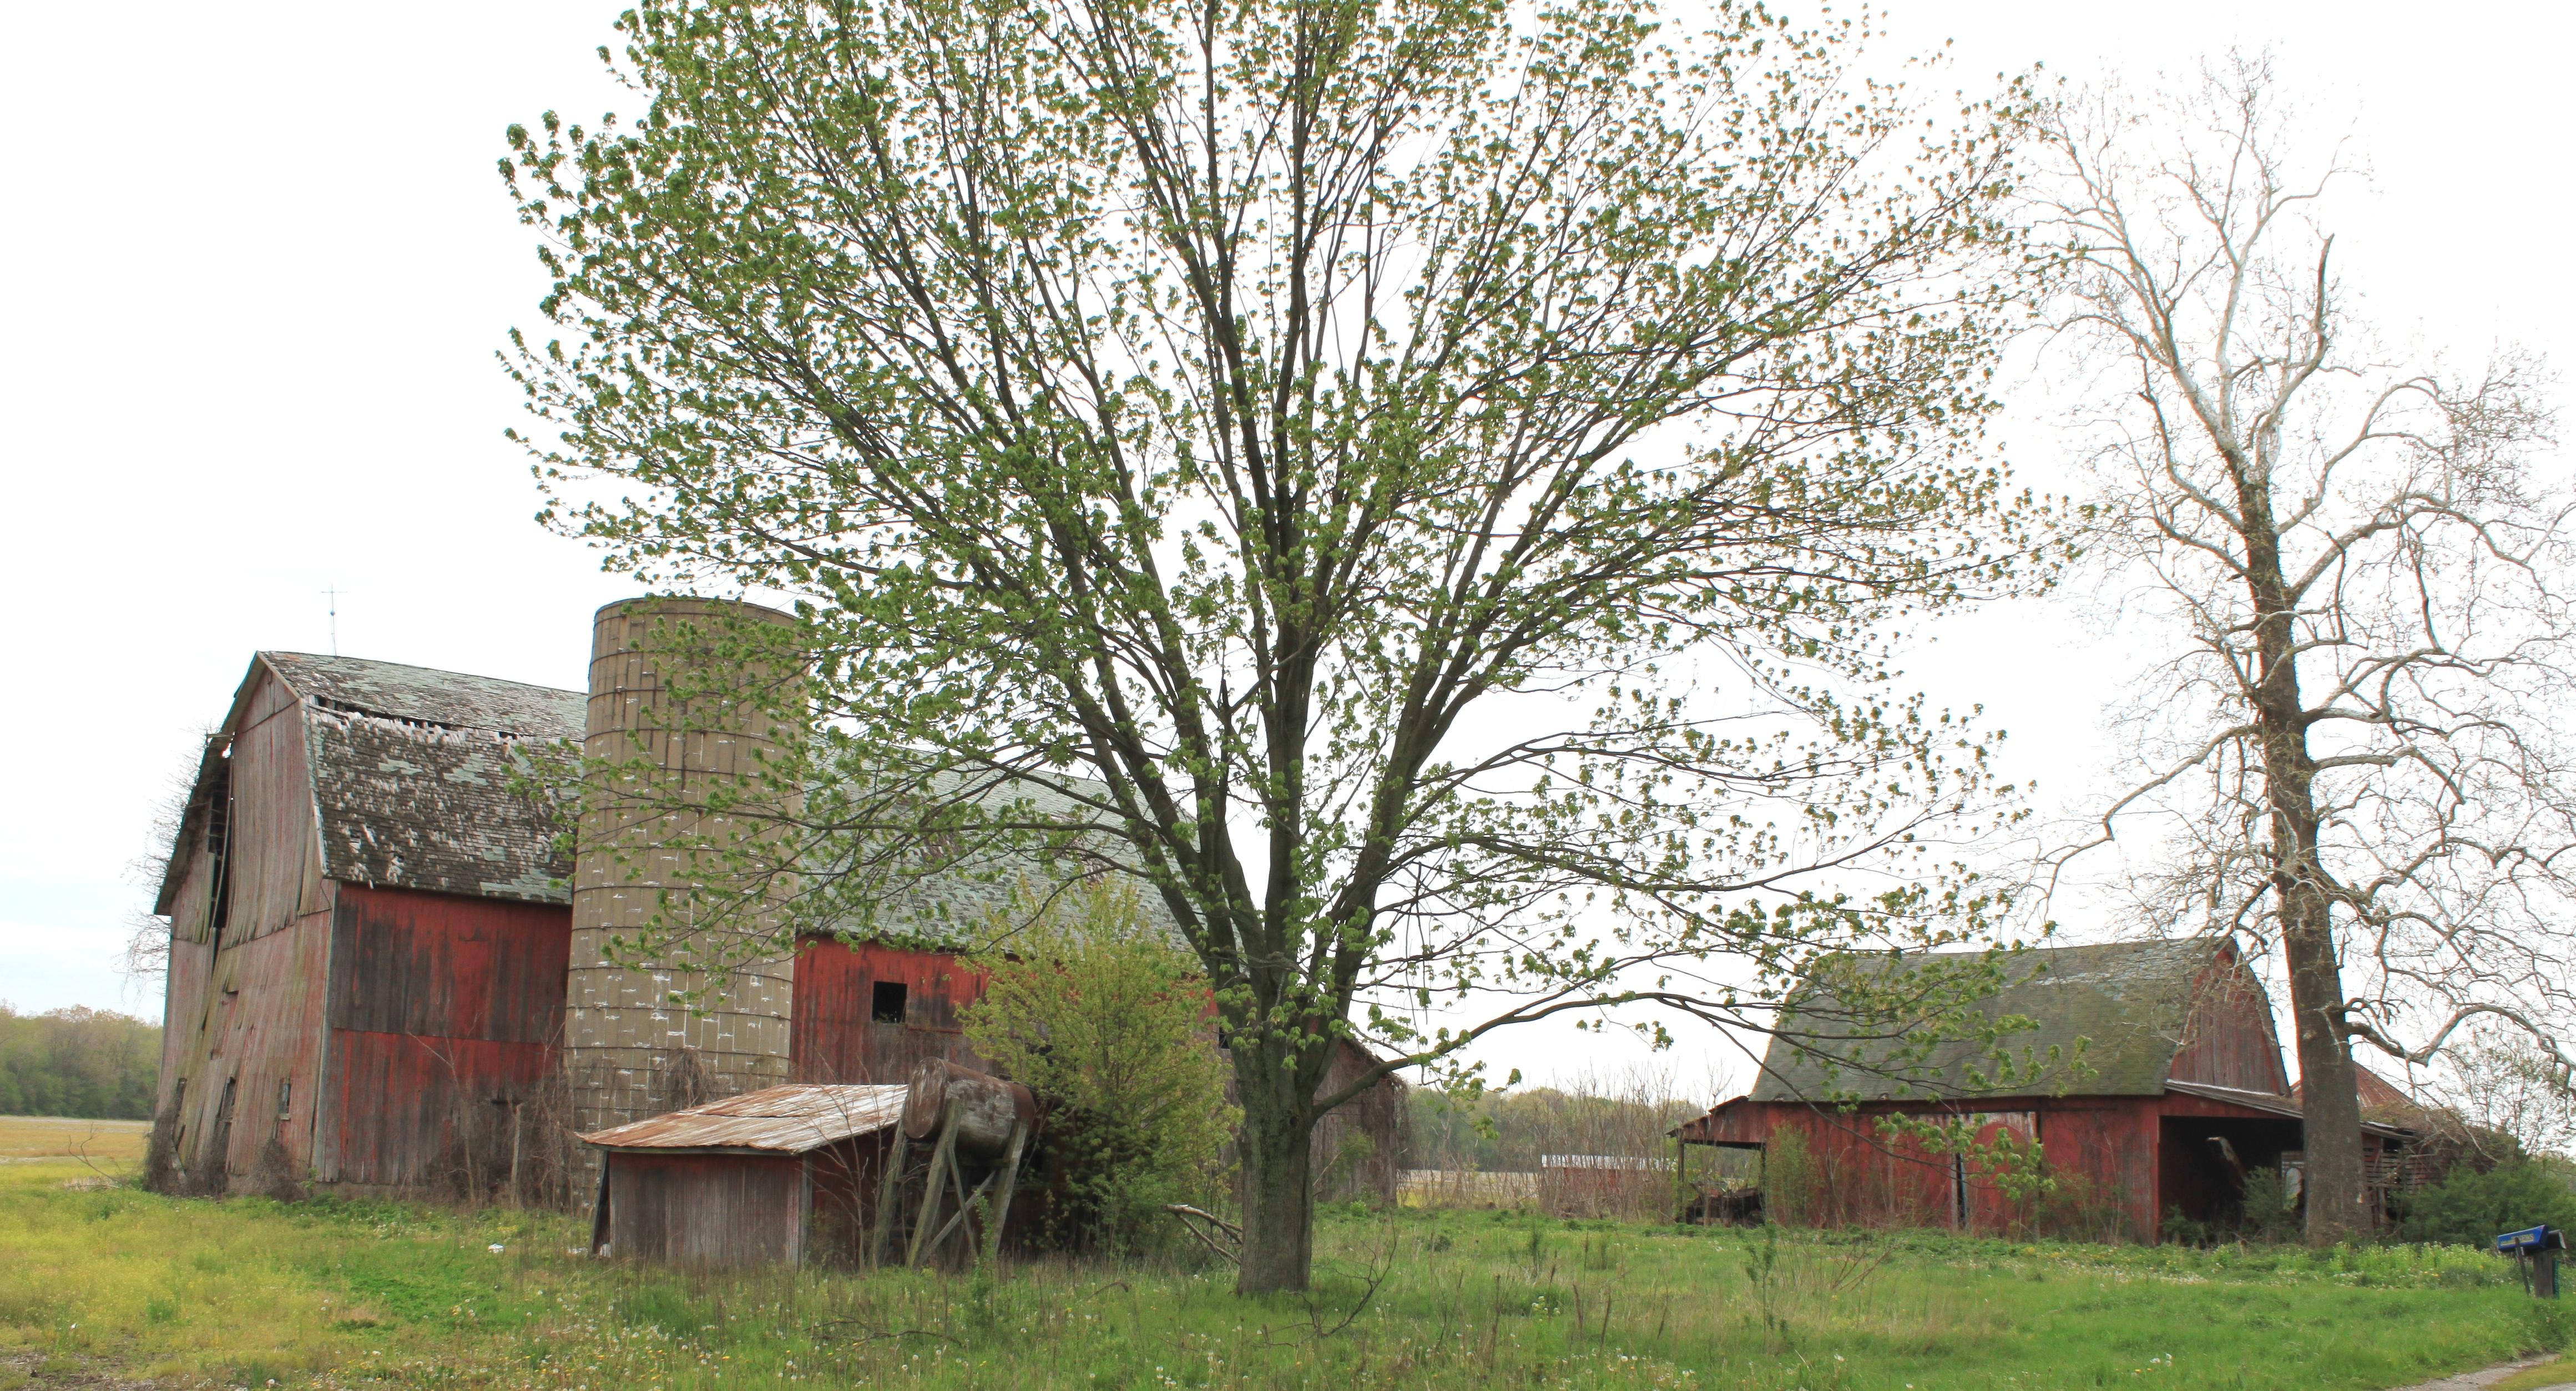 File:Dilapidated Barns York Township Michigan.JPG - Wikimedia Commonsyork township